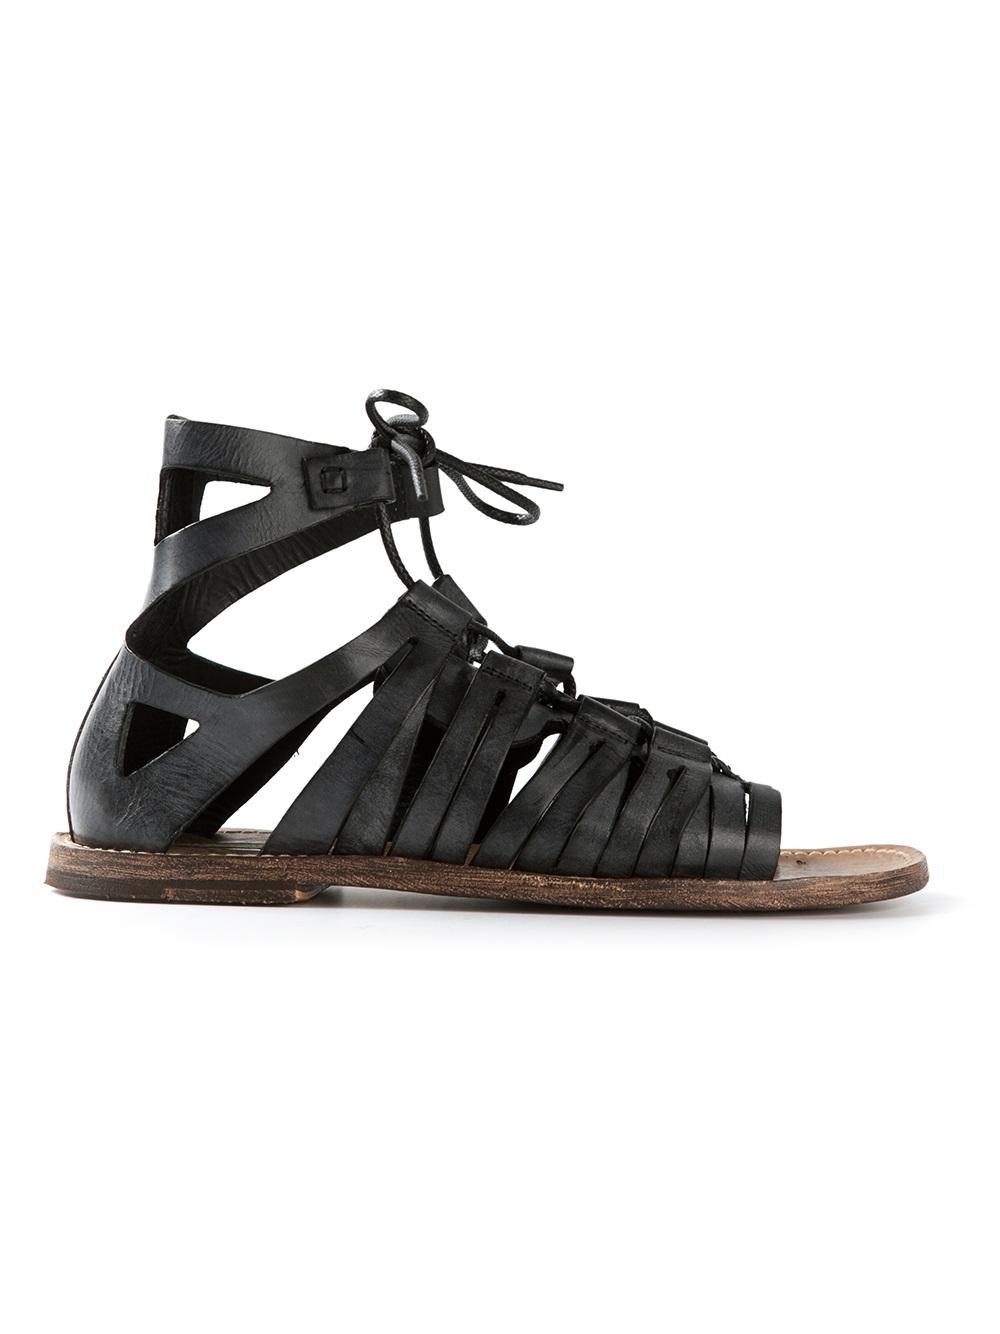 Dolce Amp Gabbana Gladiator Sandals In Grey Black For Men